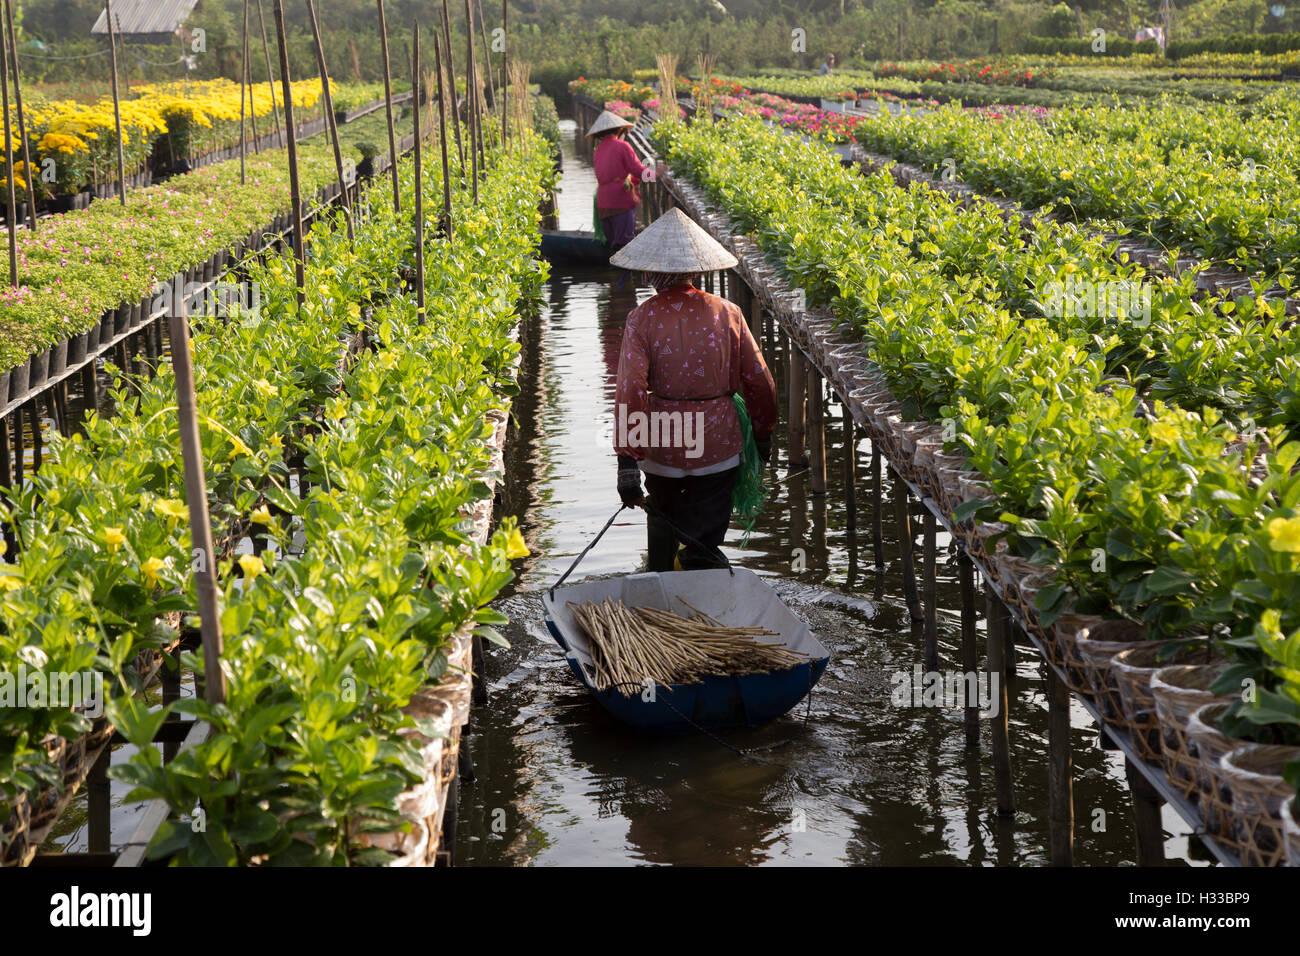 Harvesting flower in Vietnam during Holidays - Stock Image